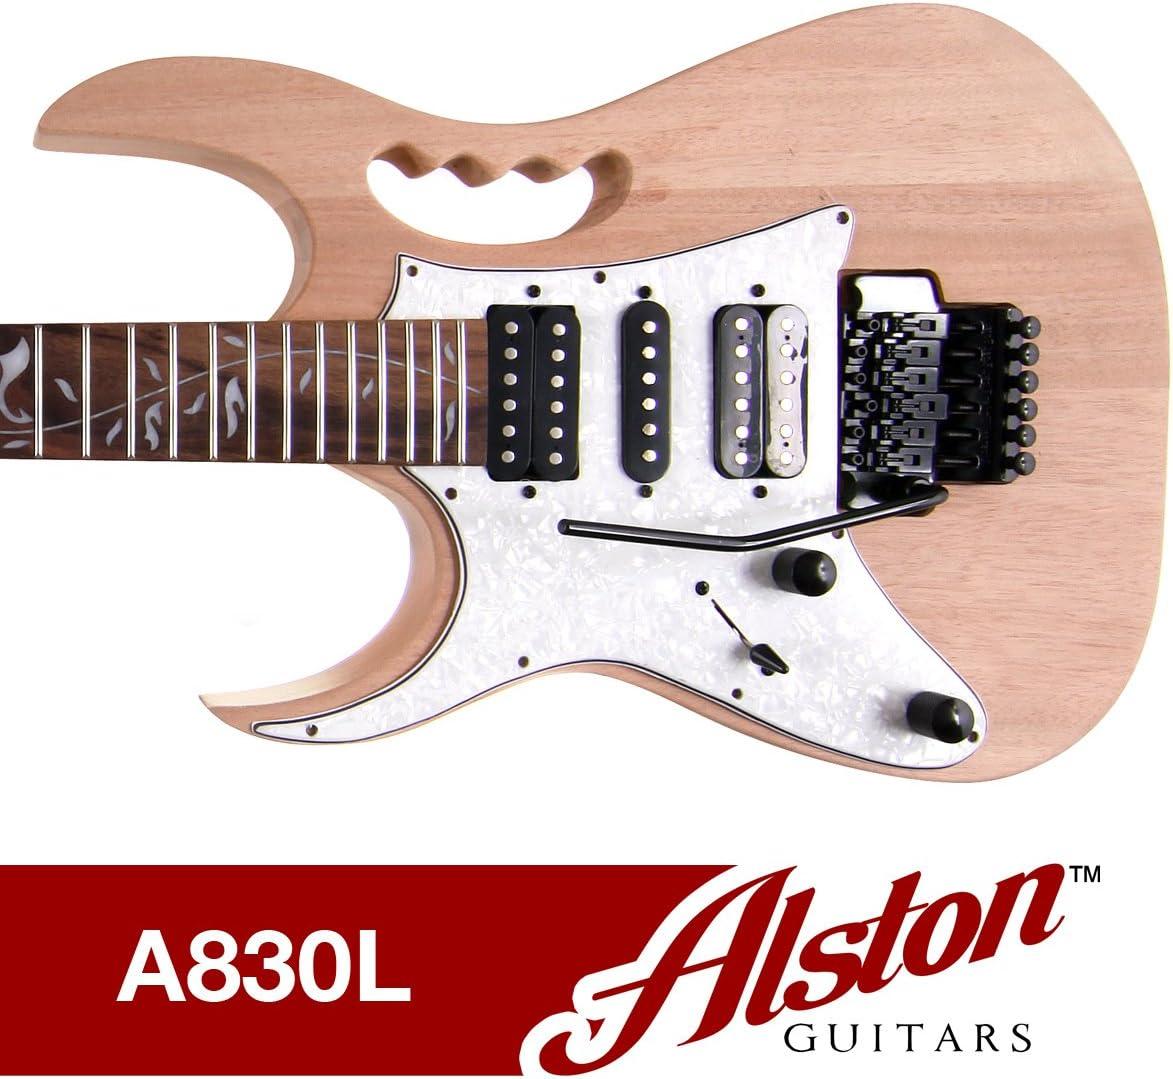 Alston – Guitarra para zurdos | – Kit de Guitarra Eléctrica ...